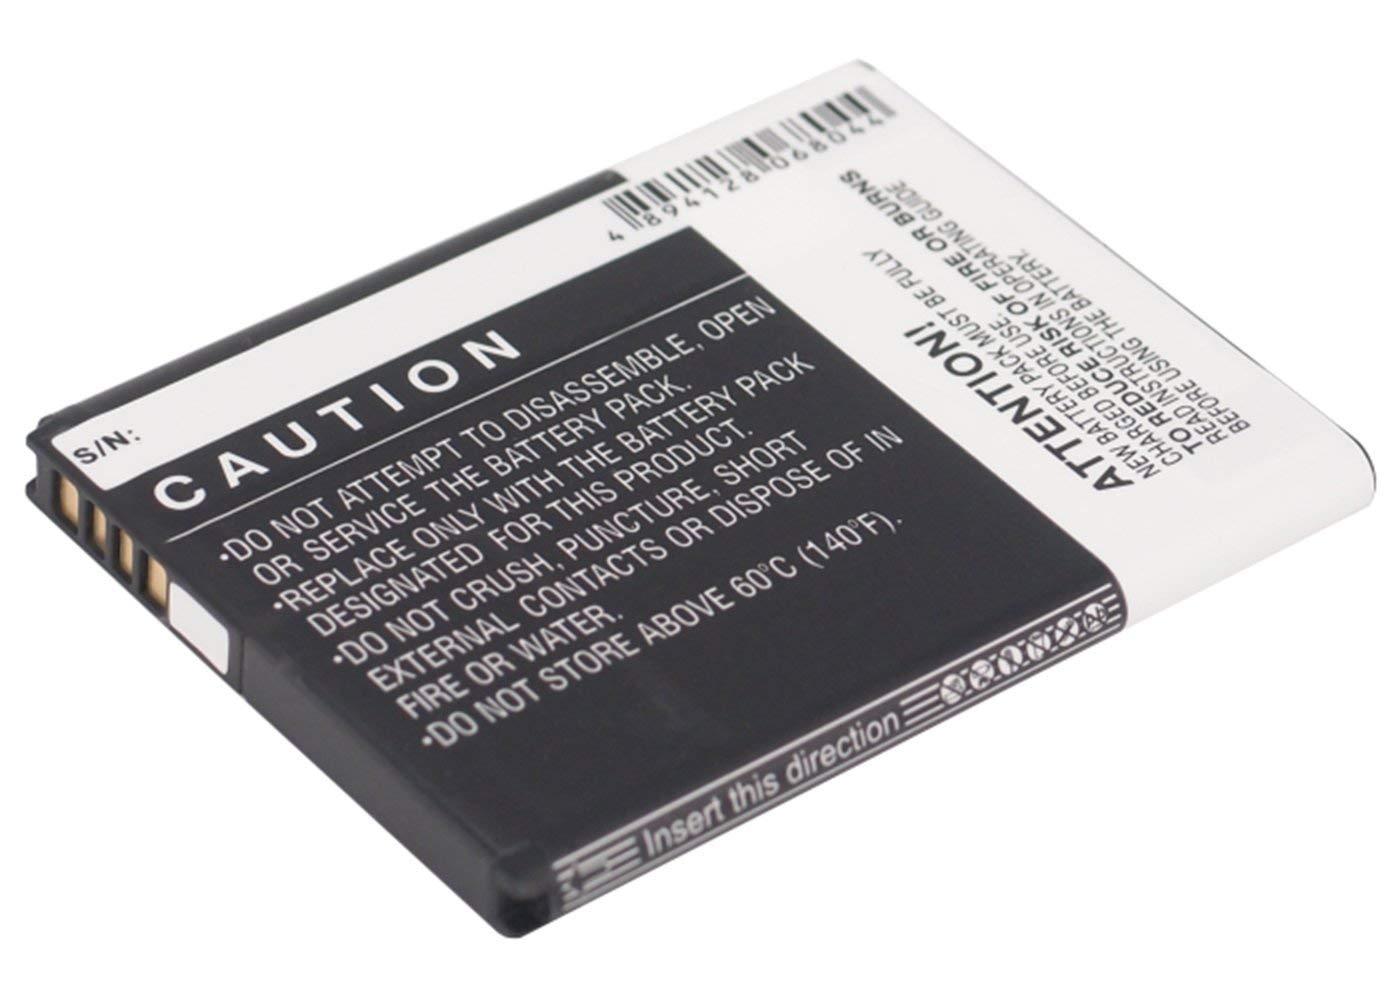 Battery Charger For HTC C520e C525c C525E CP2 Desire 500 506e 5088 L One SC ST